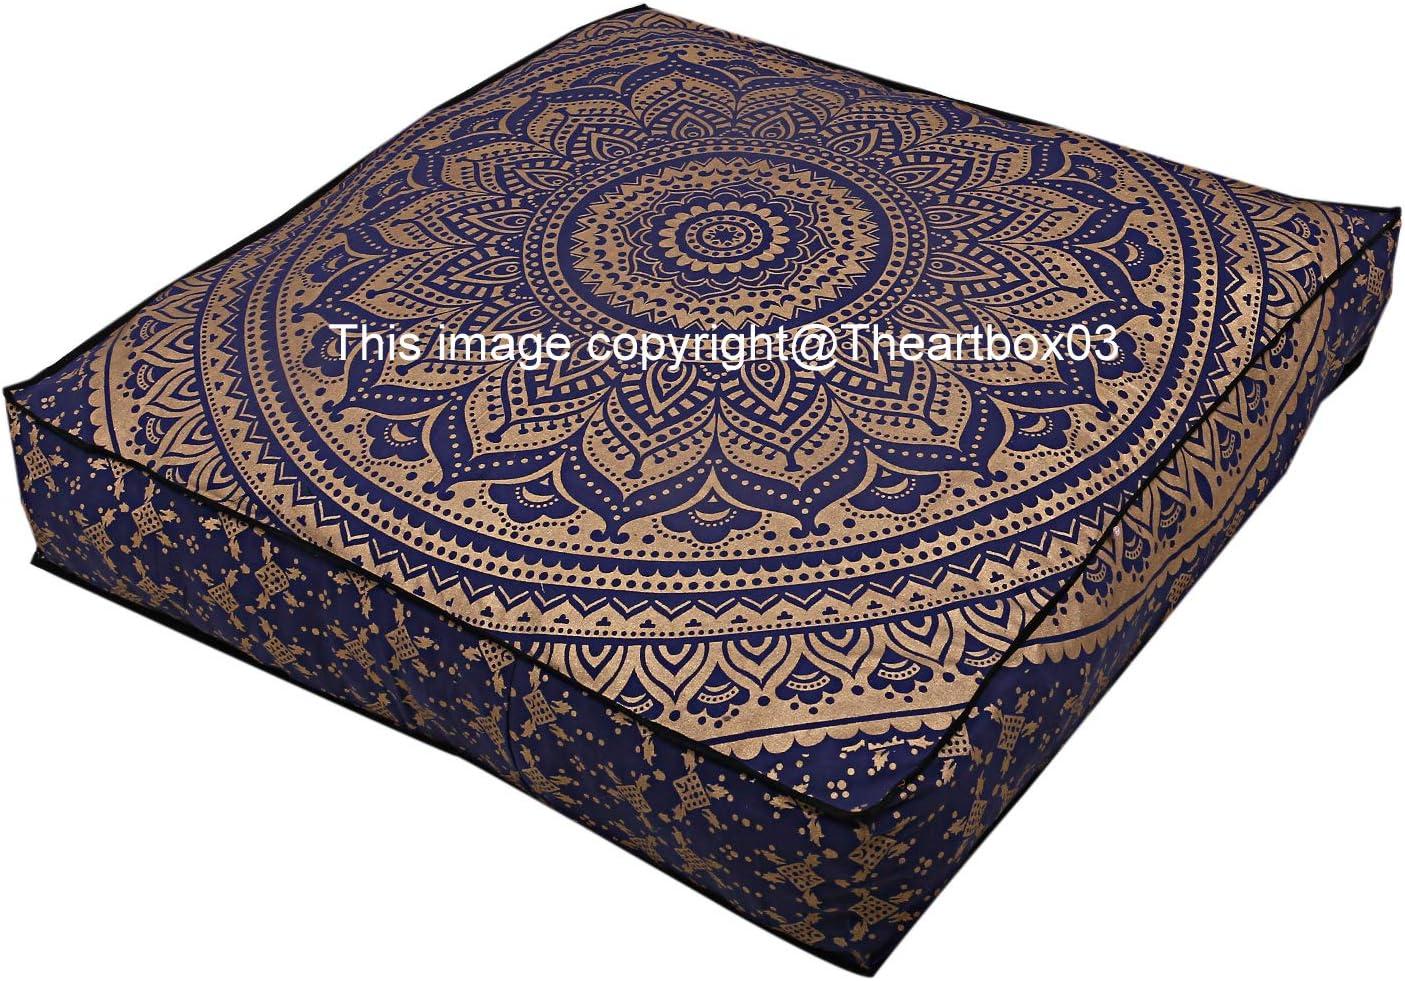 THE ART BOX Indian Ombre Mandala Ottoman Square Very popular! Pou Pillow Max 58% OFF Floor